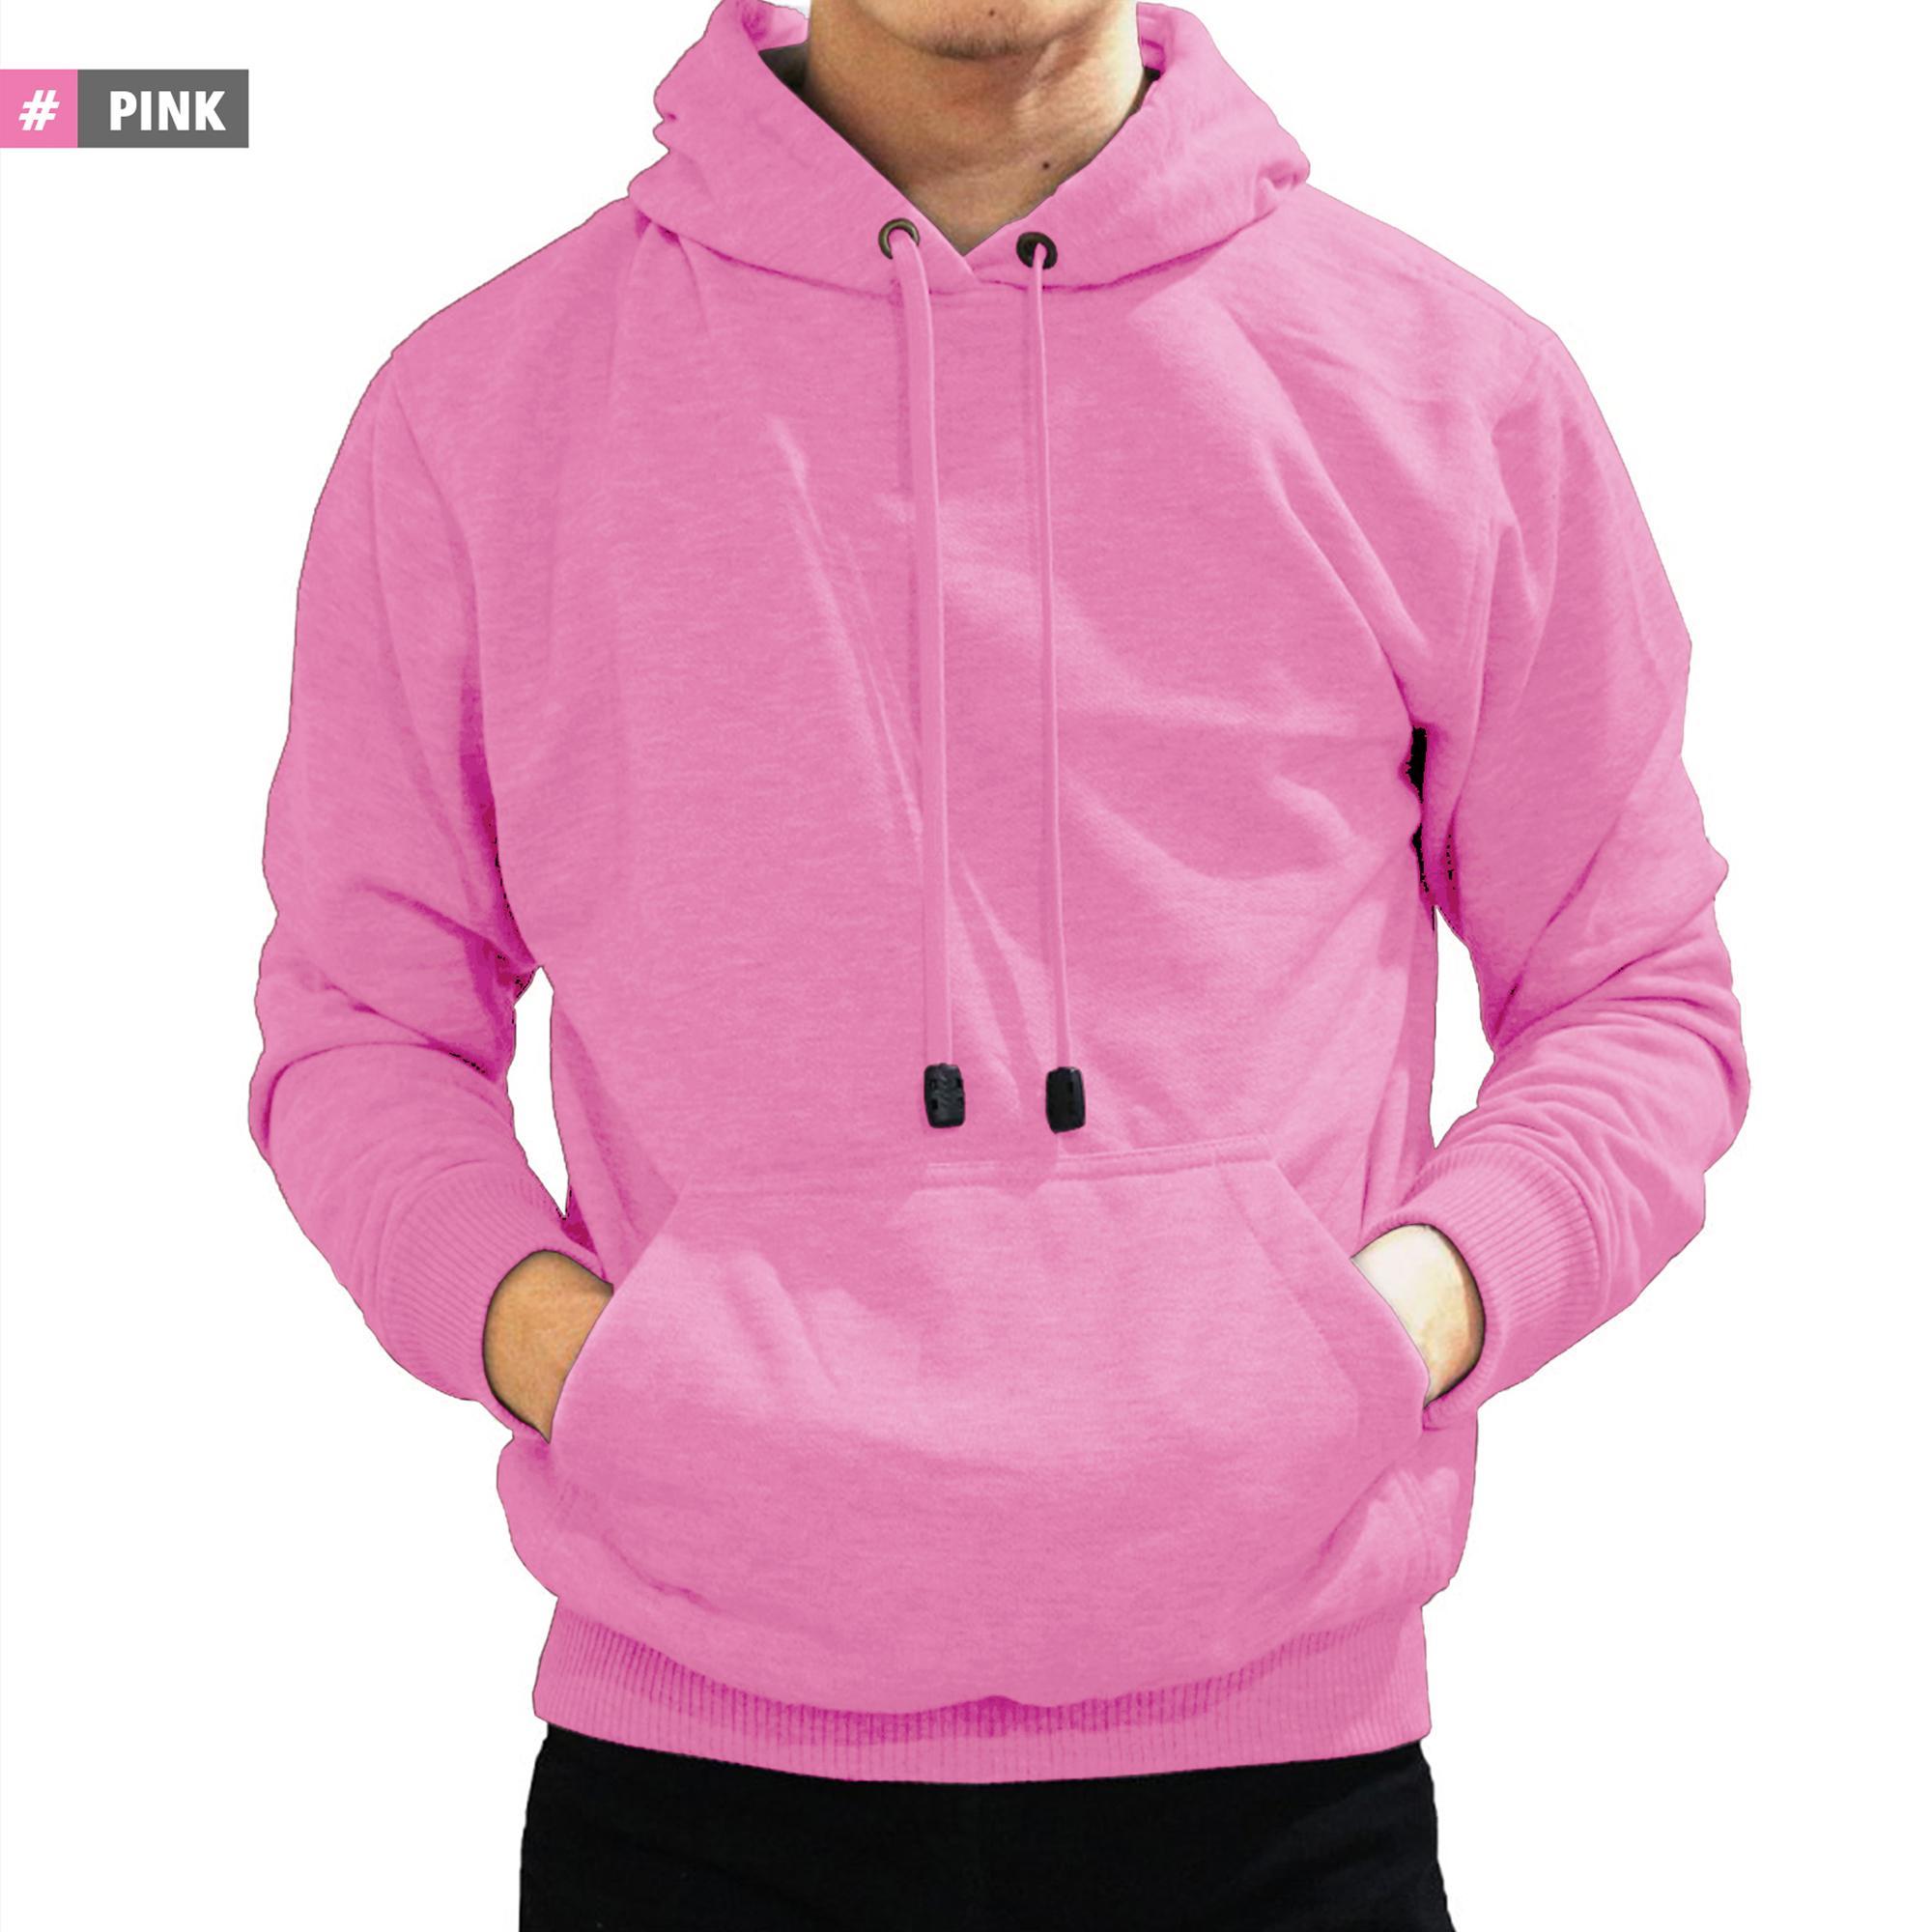 Bosbaju Jaket Sweater Bunny Peach4 Daftar Harga Terkini Janet Ols Parka Cewek Polos Pria Pink